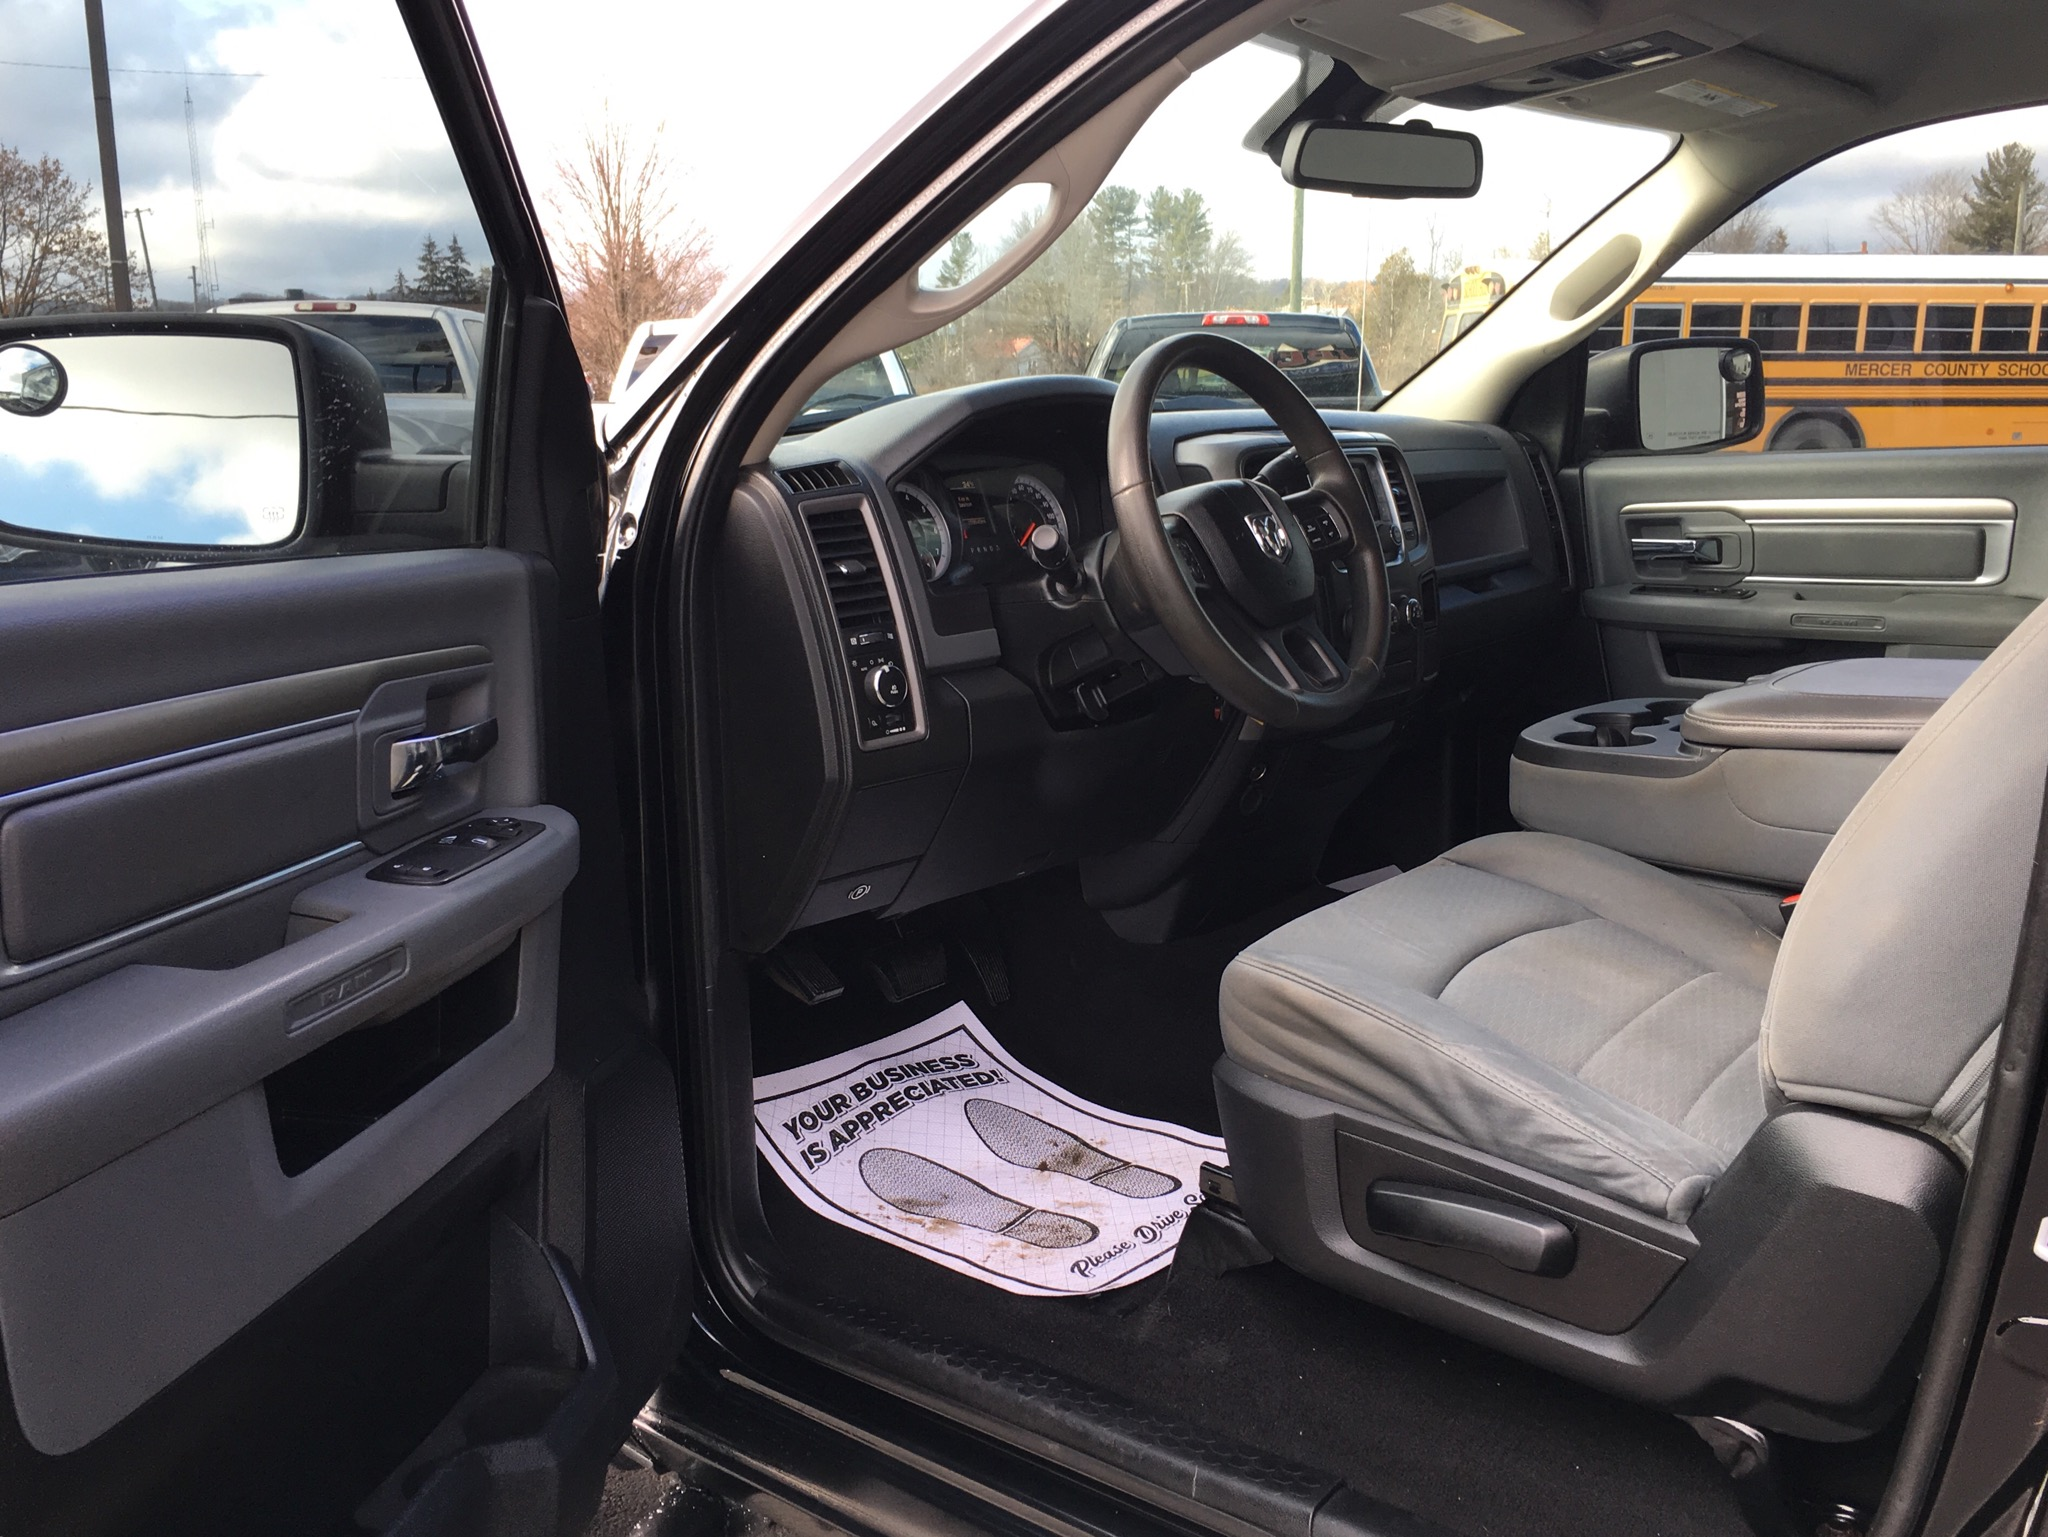 2013 RAM 1500 REG. CAB BLACK